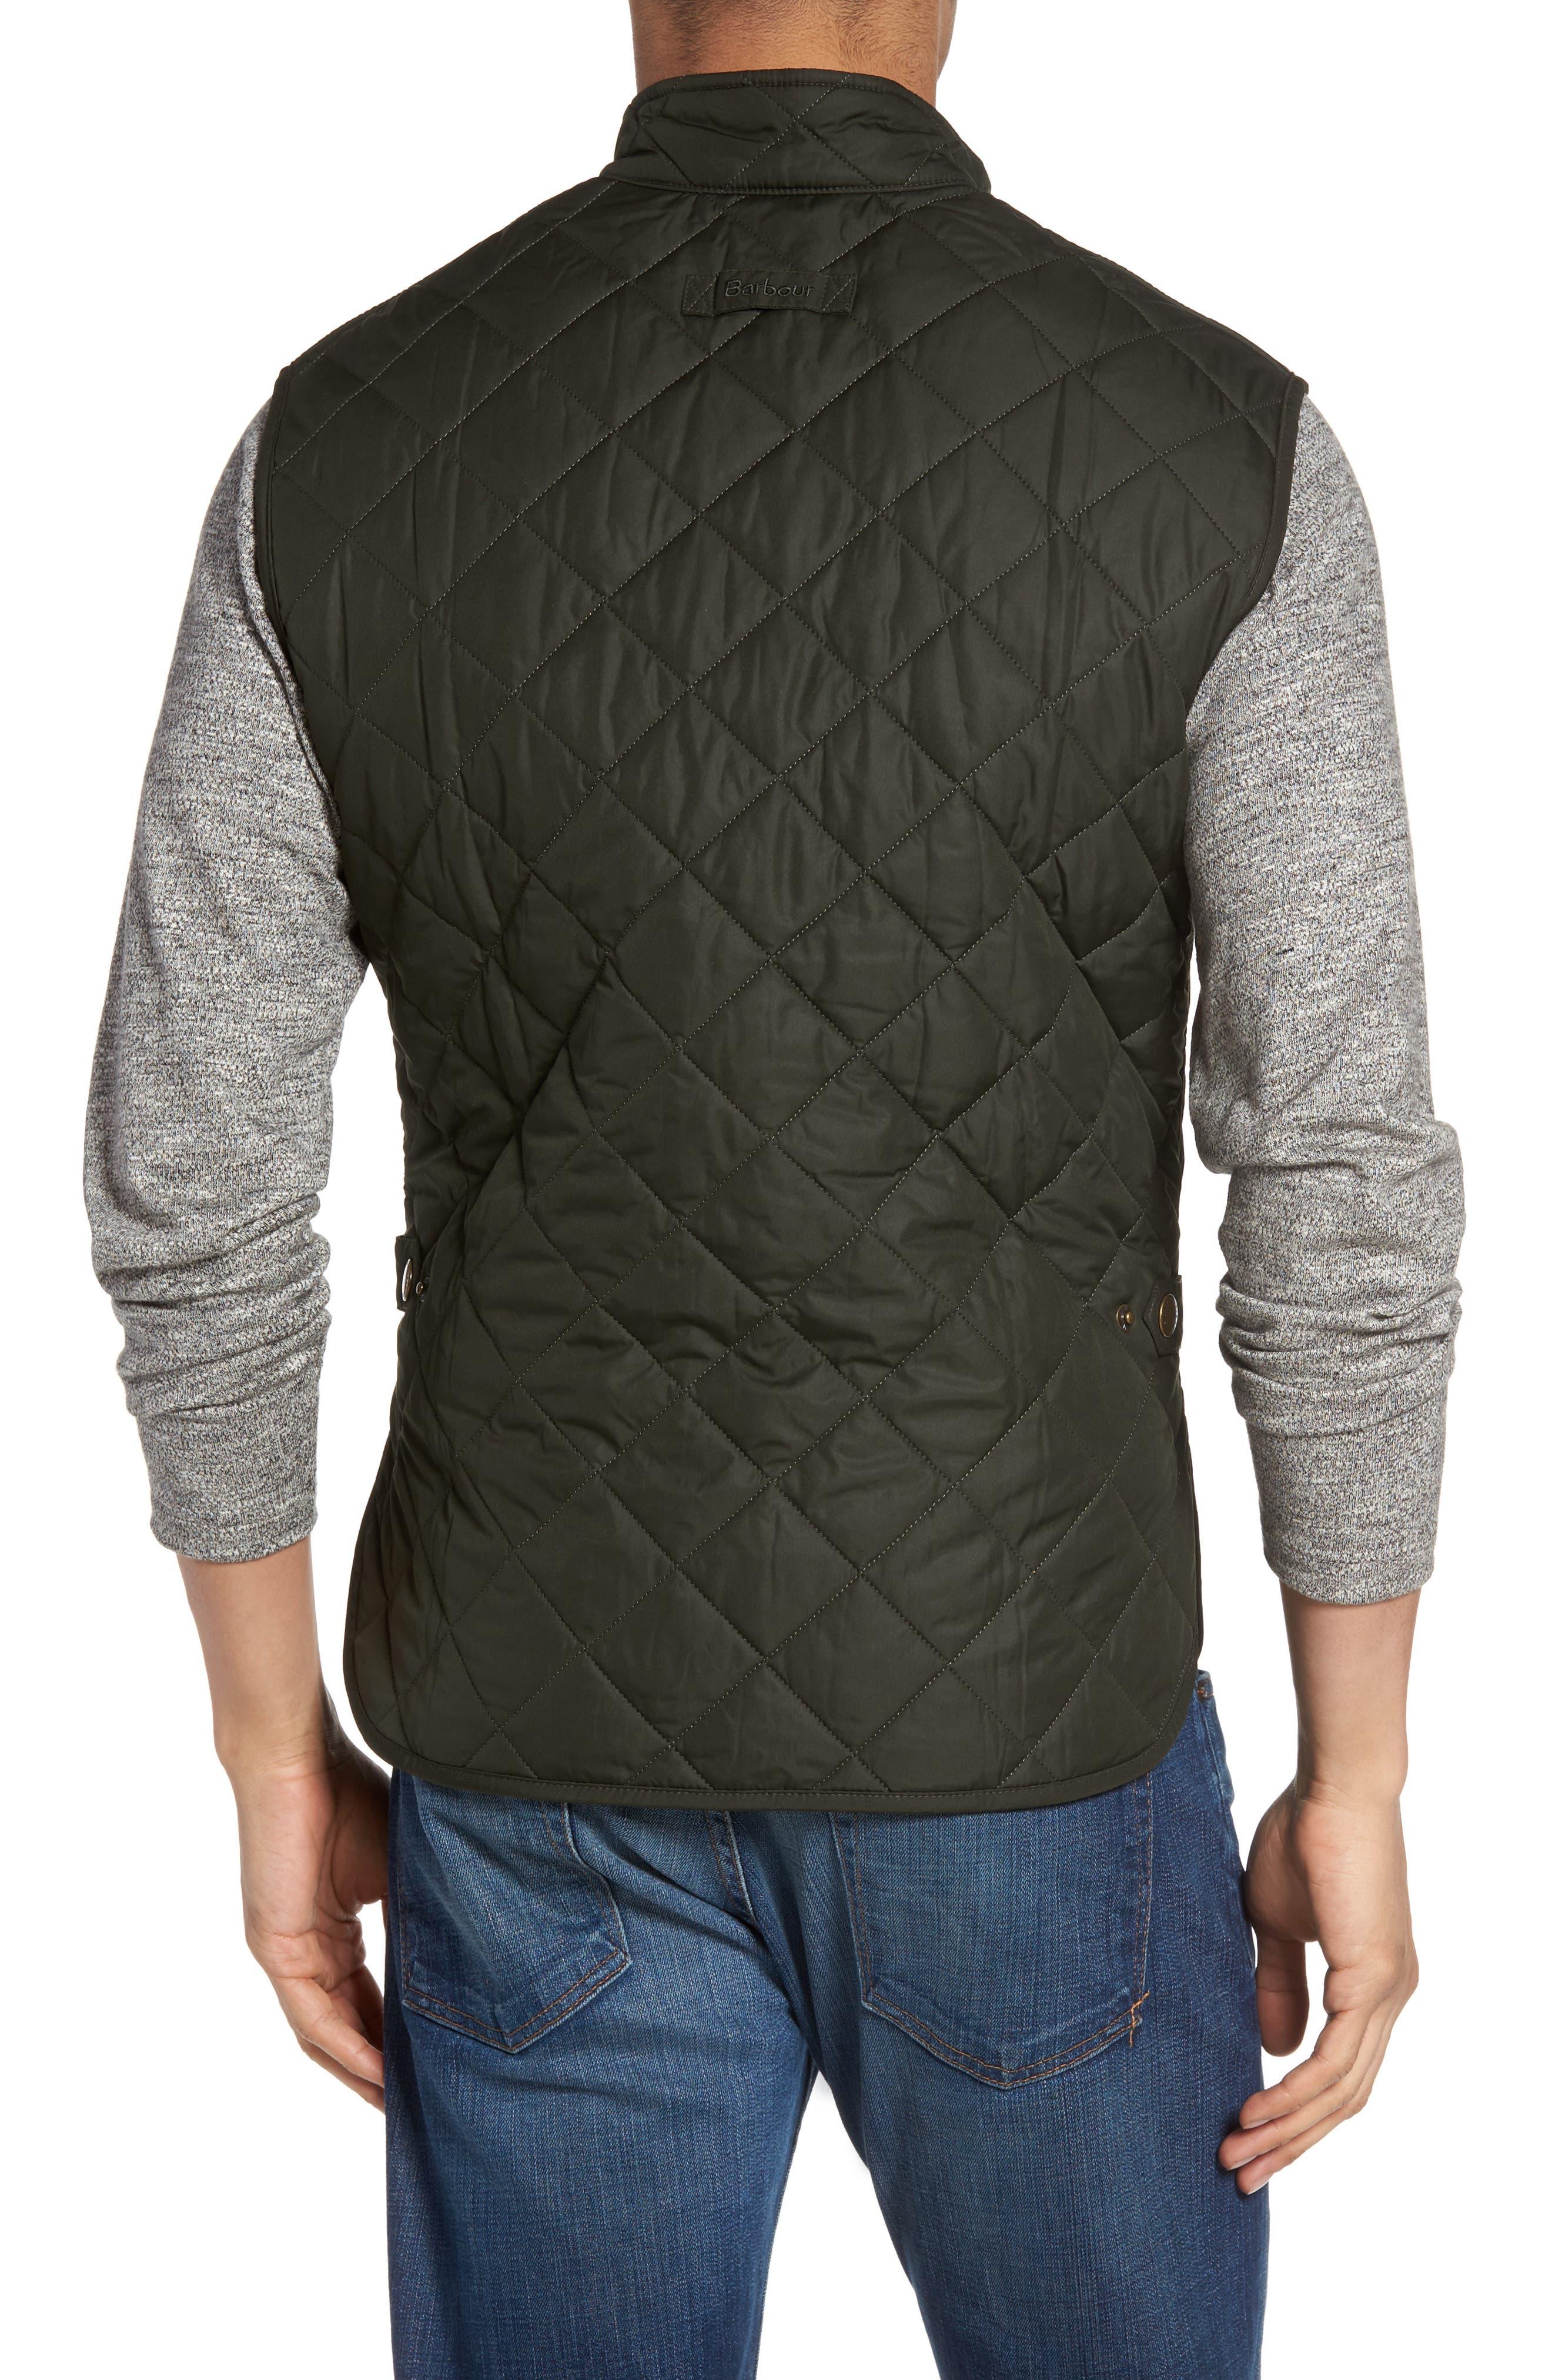 Alternate Image 3  - Barbour 'Lowerdale' Trim Fit Quilted Vest